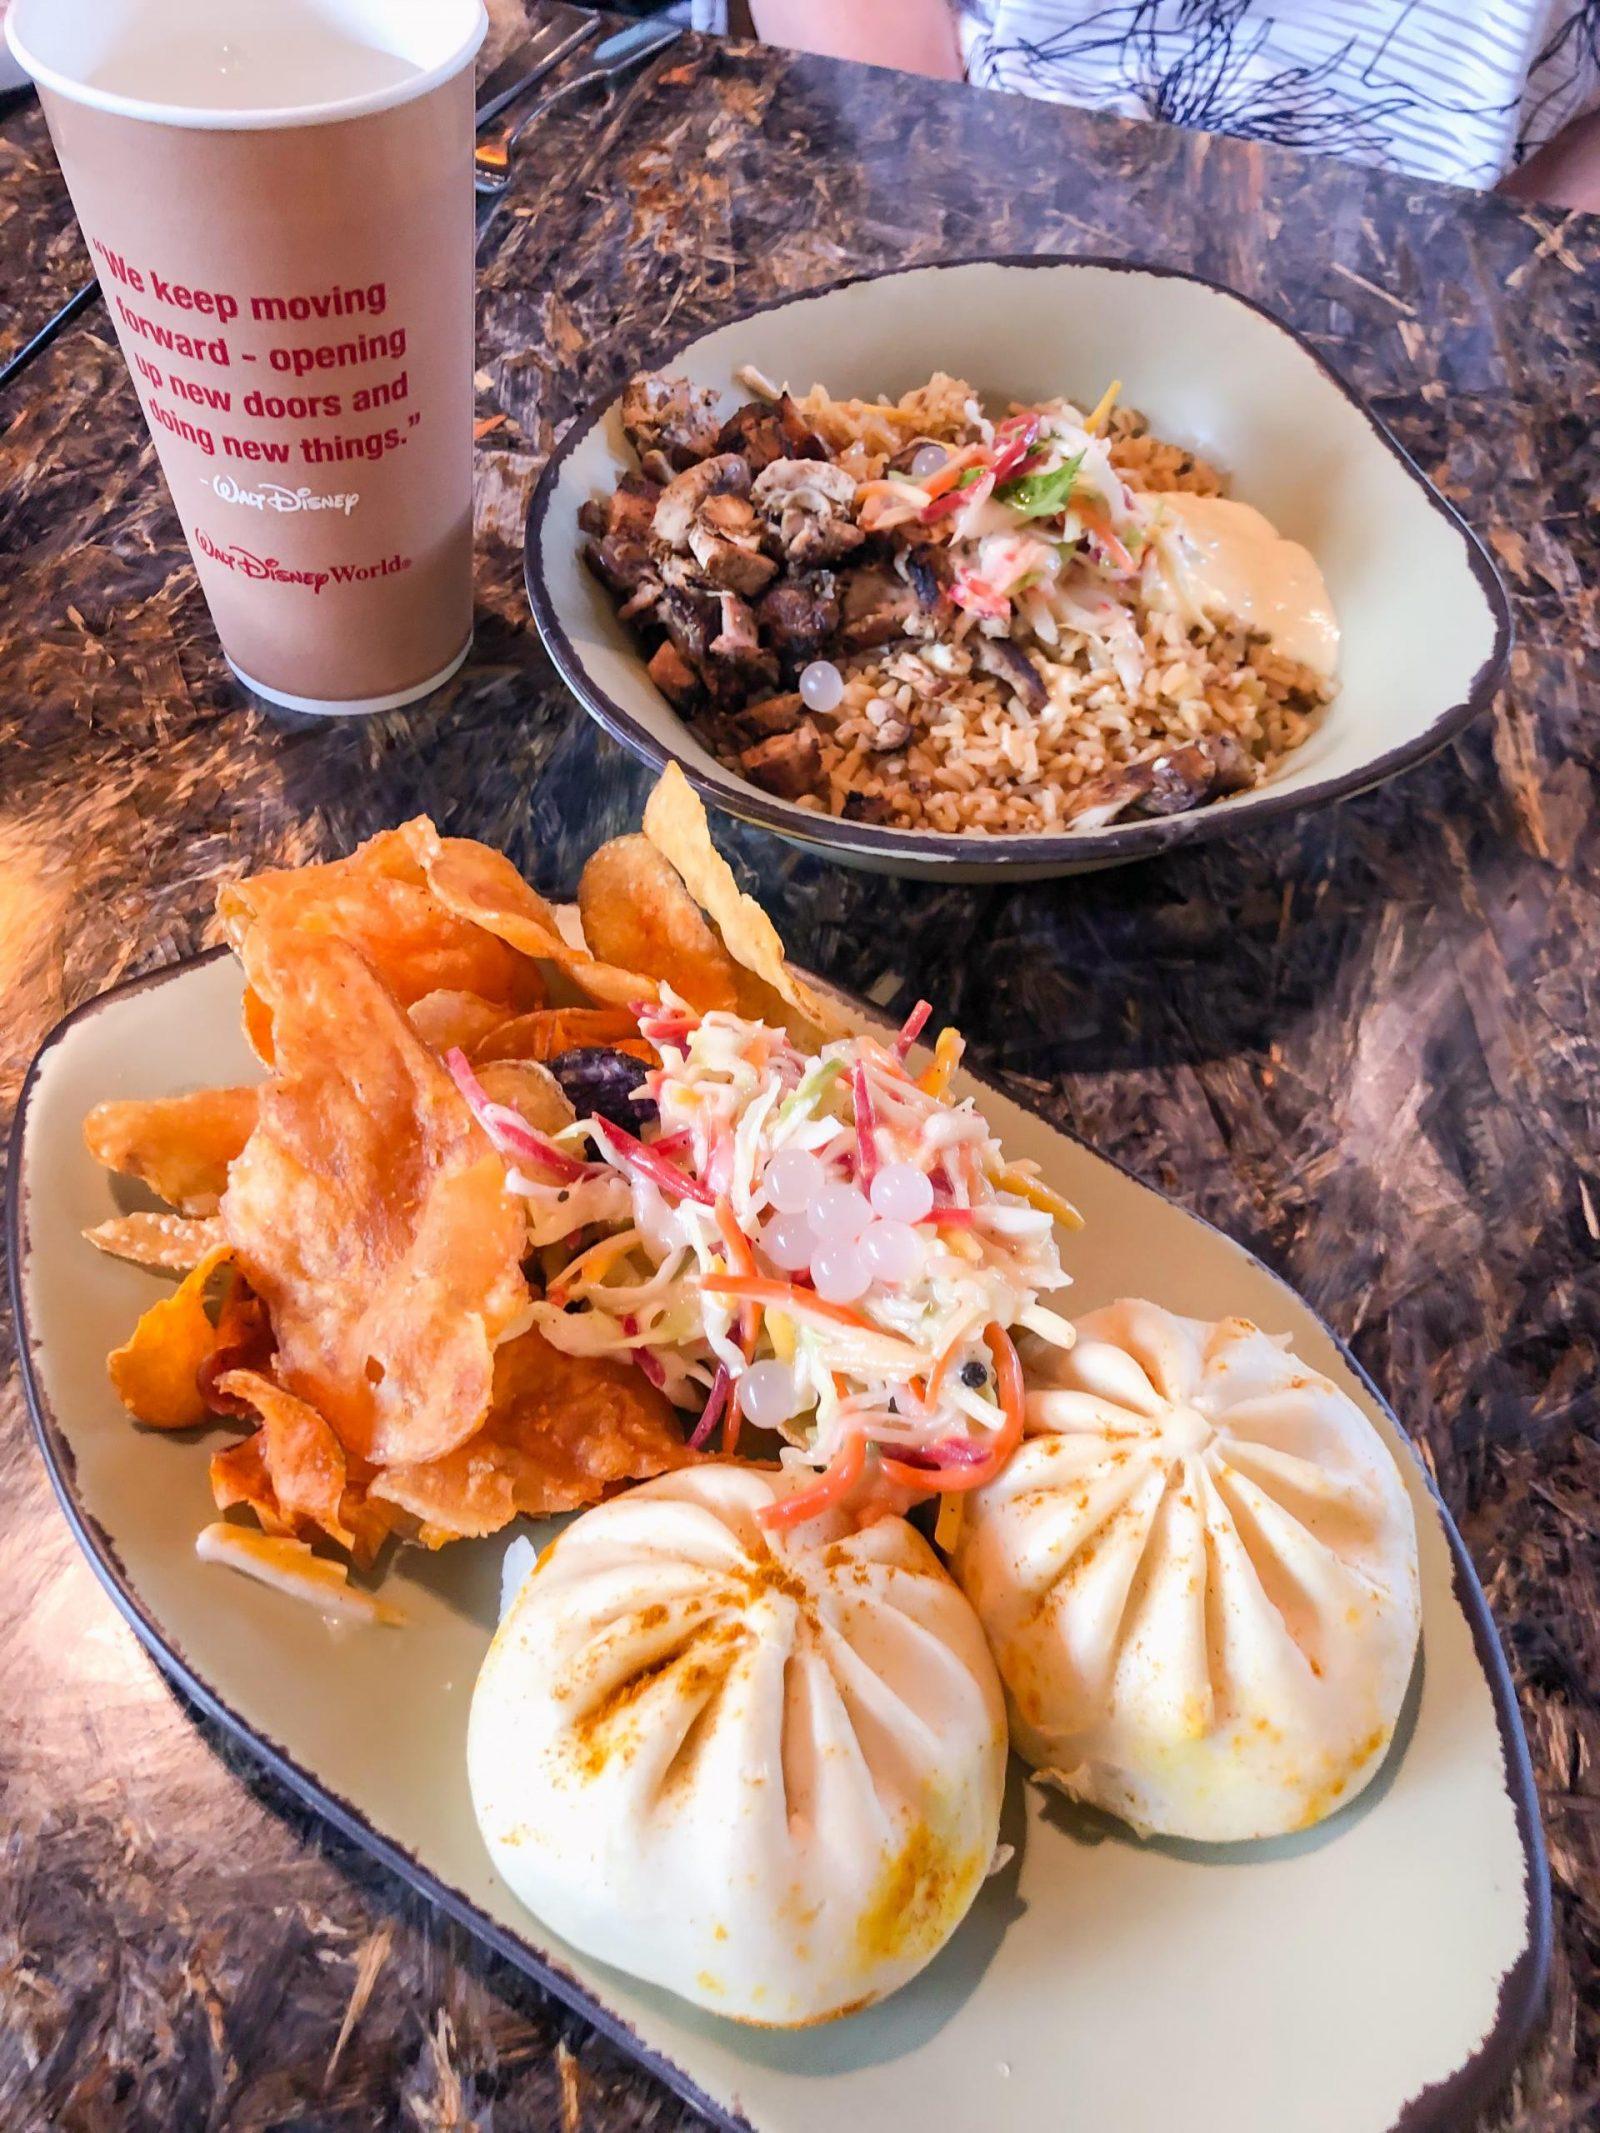 Cheeseburger Pods and Combination Bowl at Satu'li Canteen - Quick Service Restaurants at Disney World